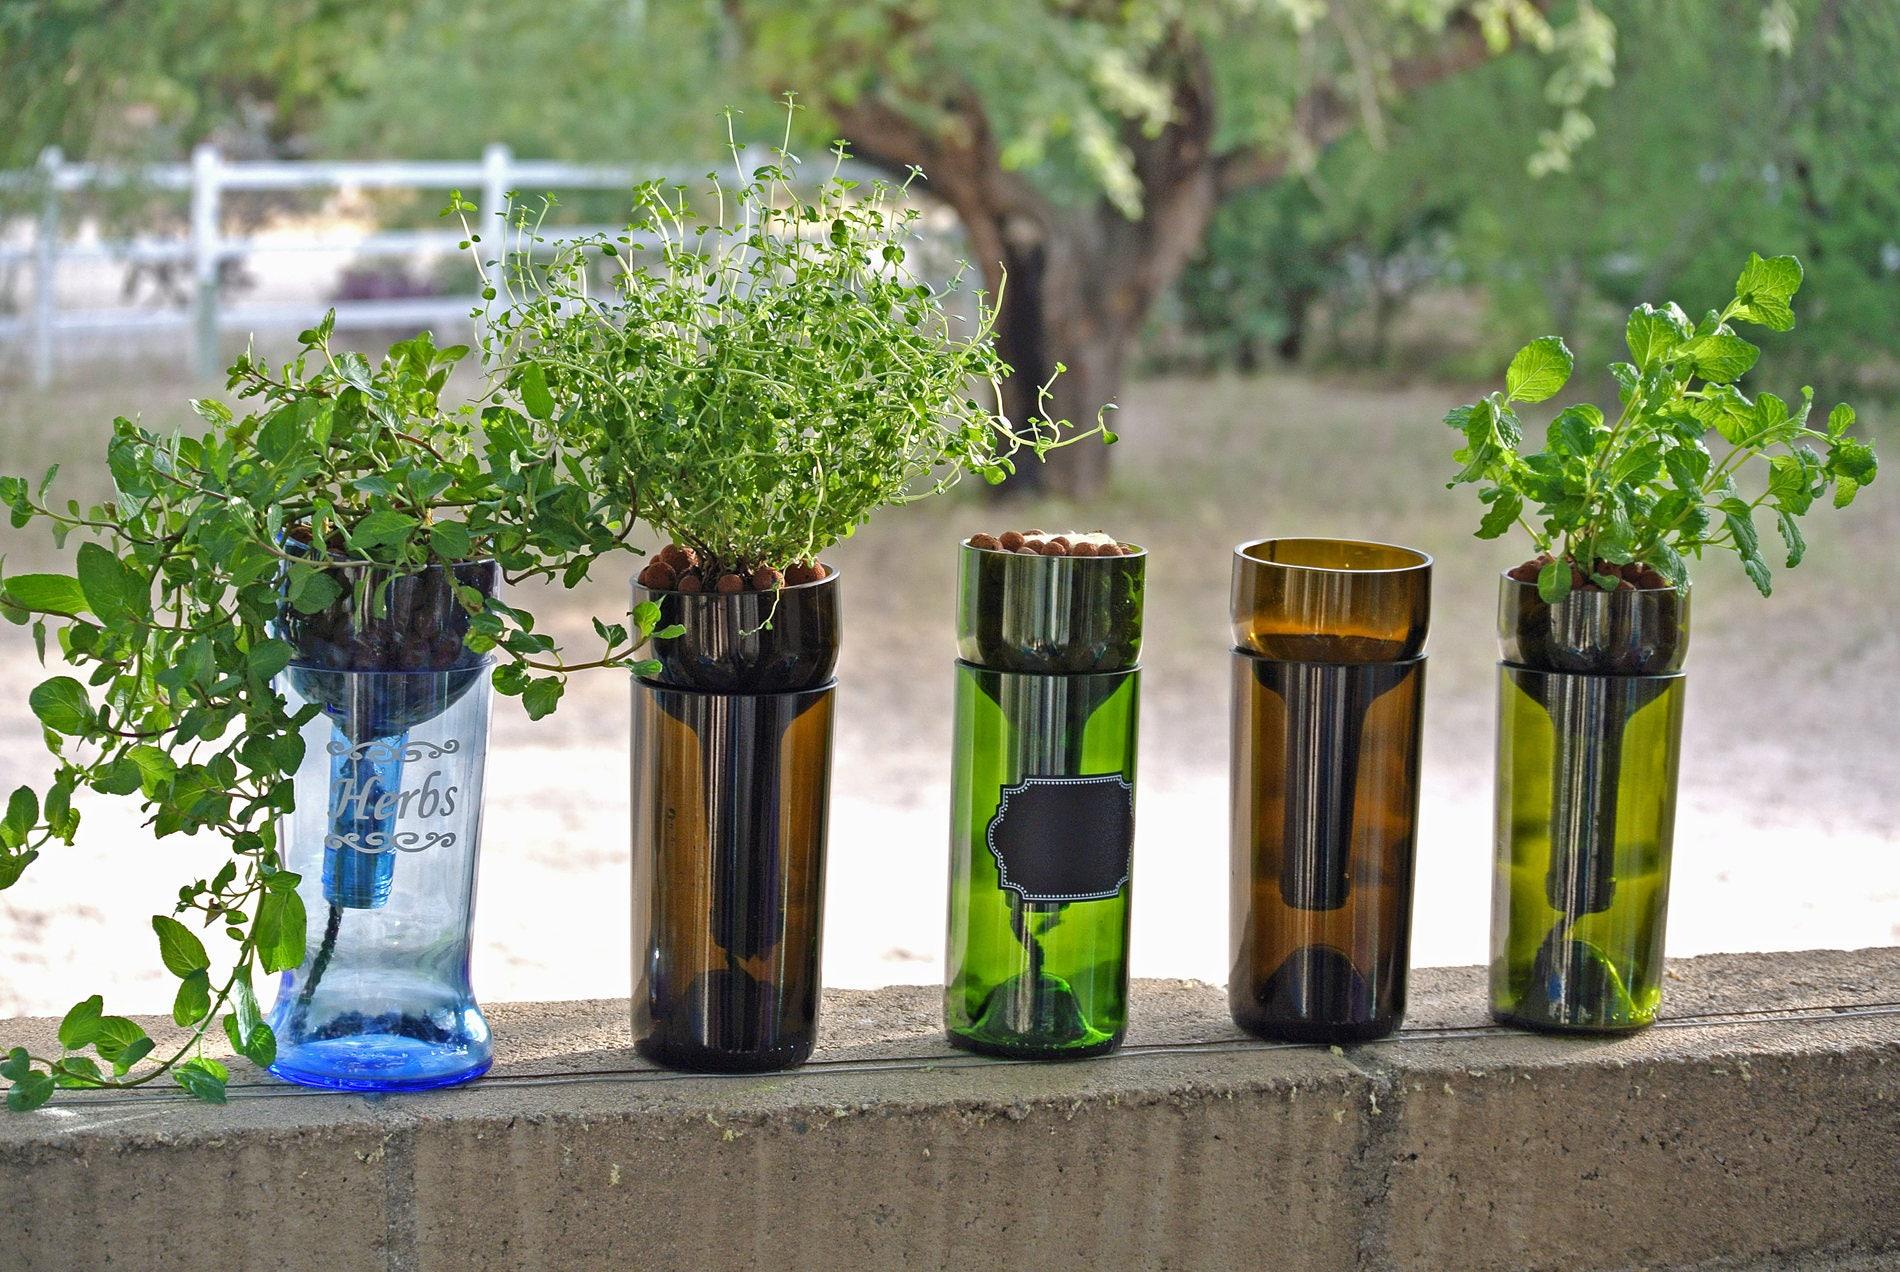 Hydroponic Garden In Wine Bottle / Indoor Herb Garden / Wine Gift Bottle  Planter / Herbs